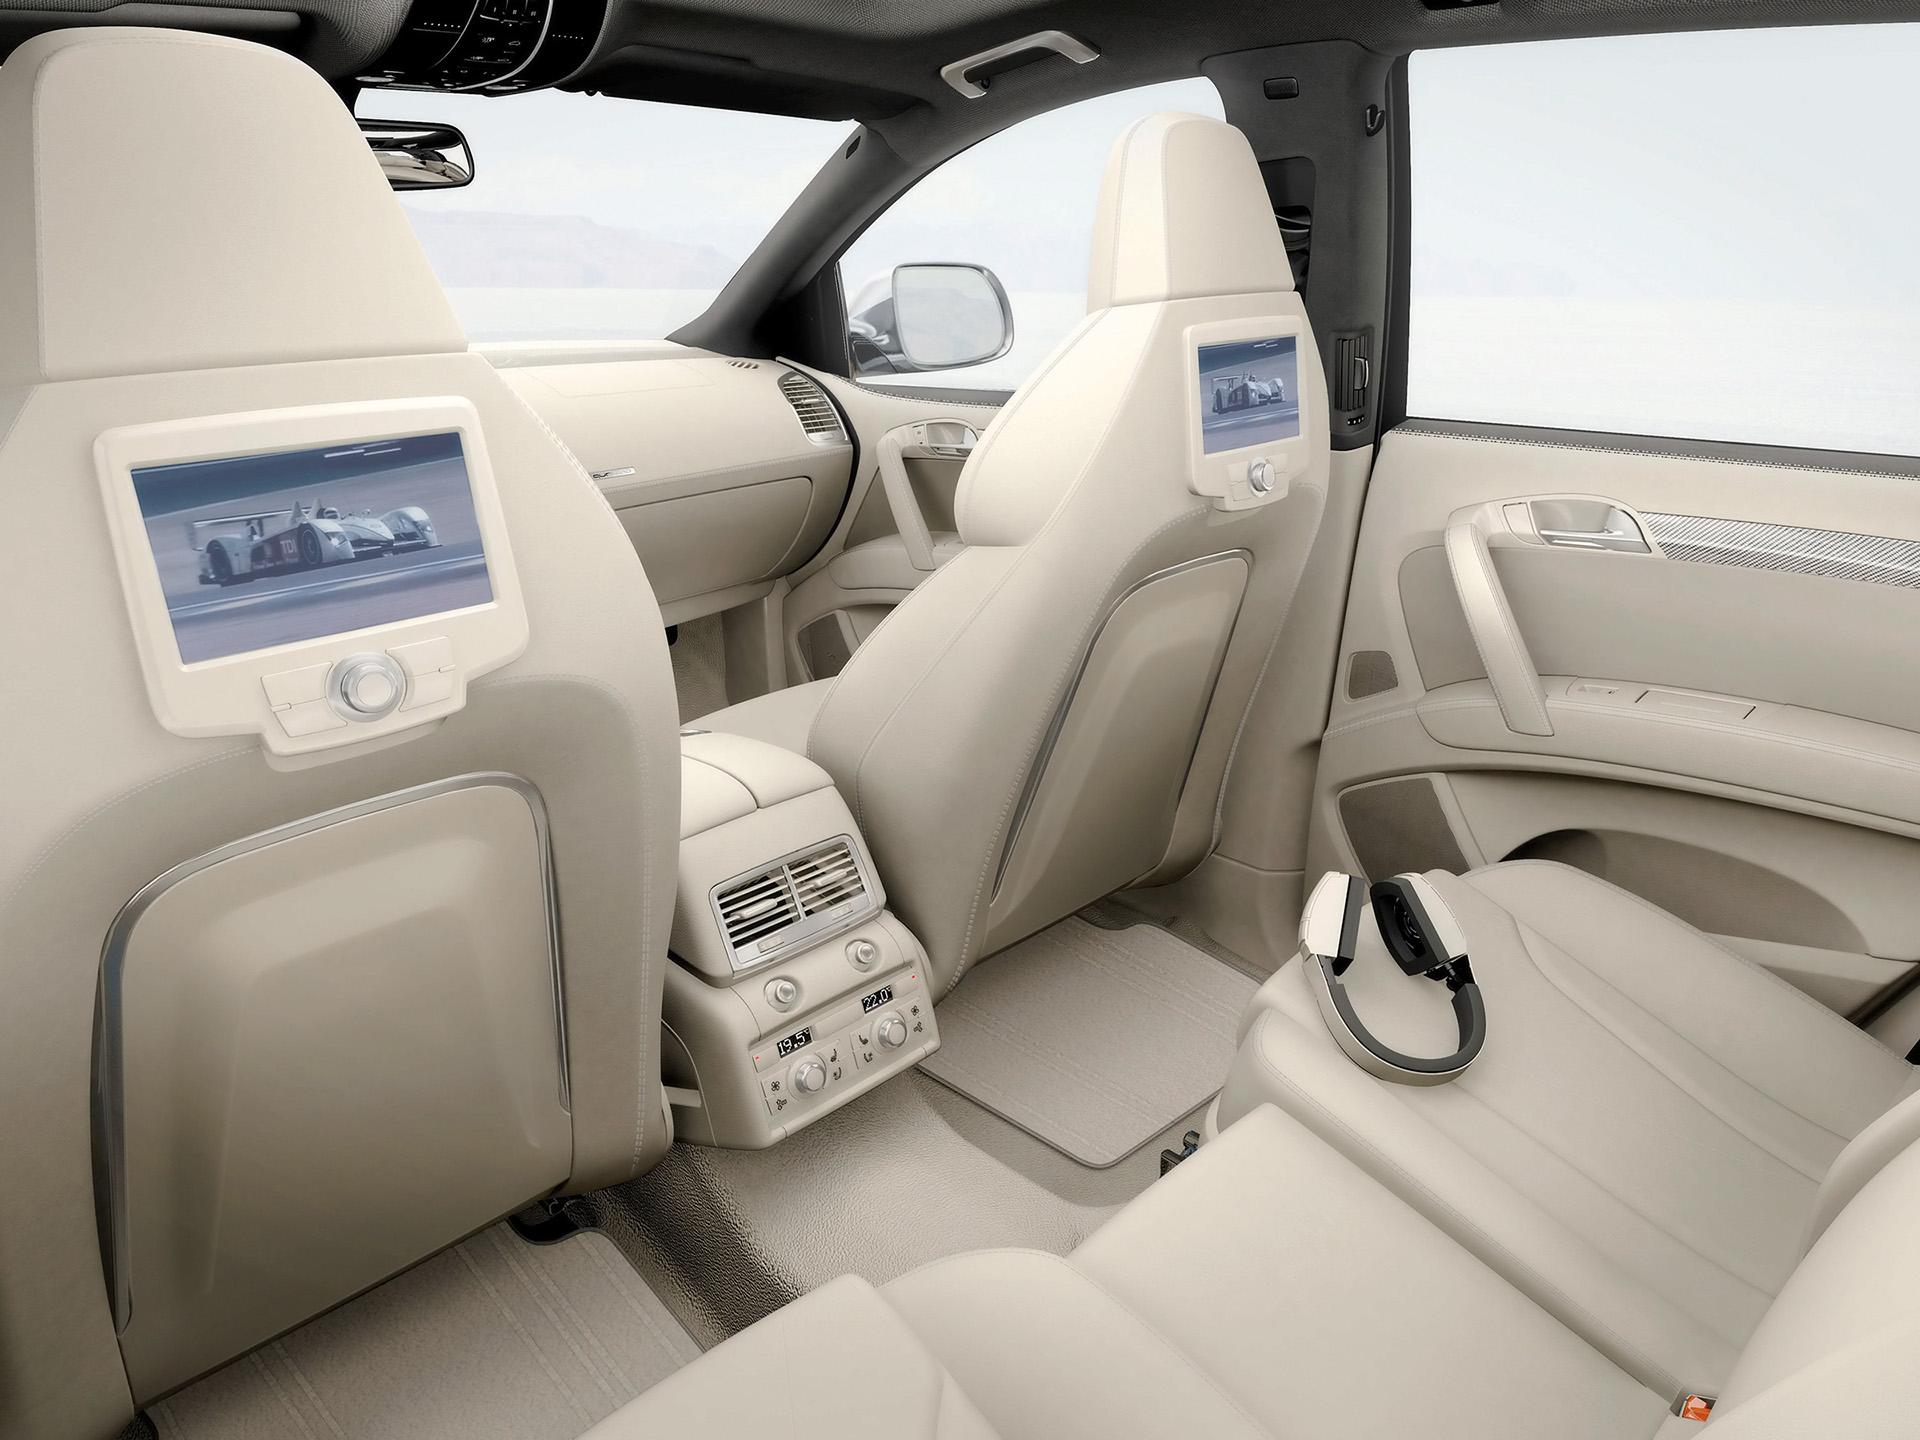 Index Of Wpcontentuploadsarabaresimleriaudiaudiqvtdi - Audi q7 v12